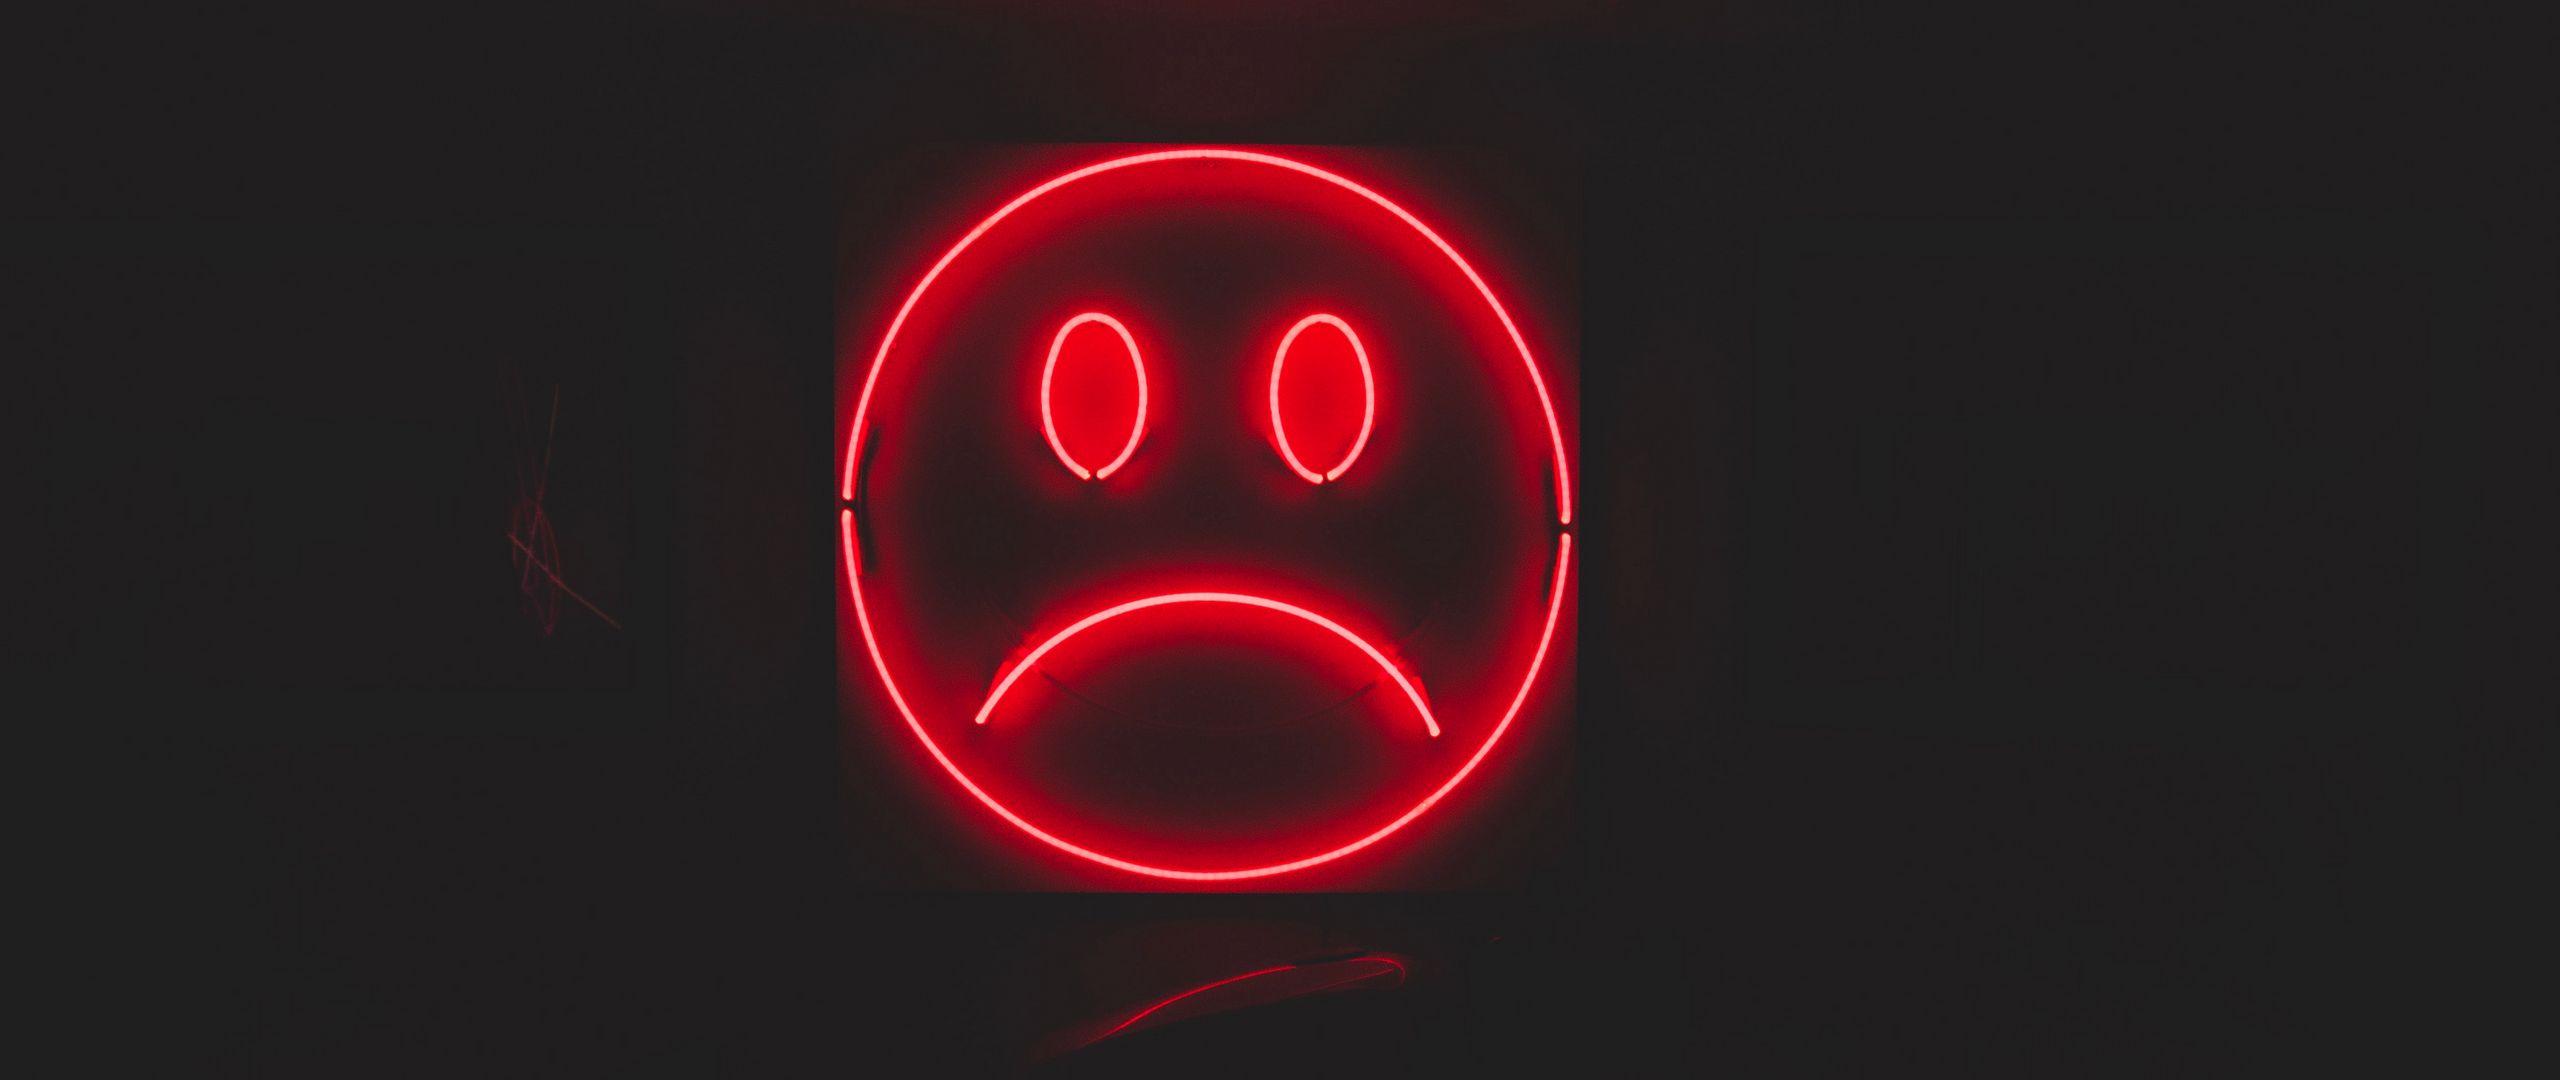 2560x1080 Wallpaper smile, smiley, sad, neon, red, dark